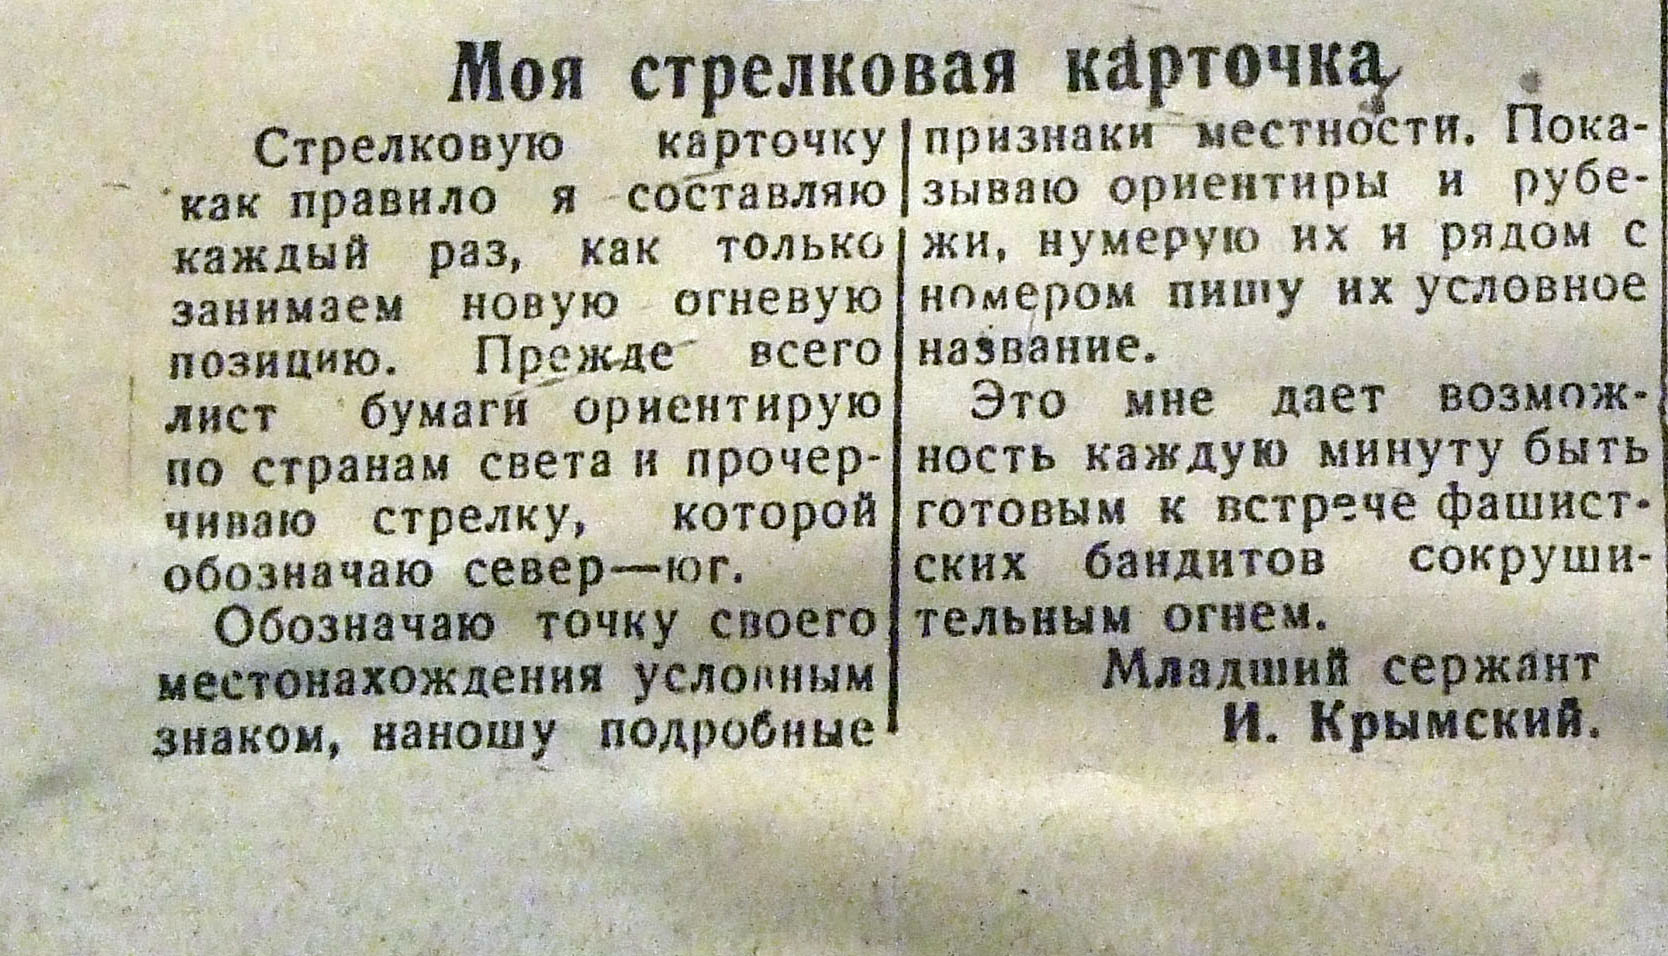 http://s1.uploads.ru/eFWzf.jpg